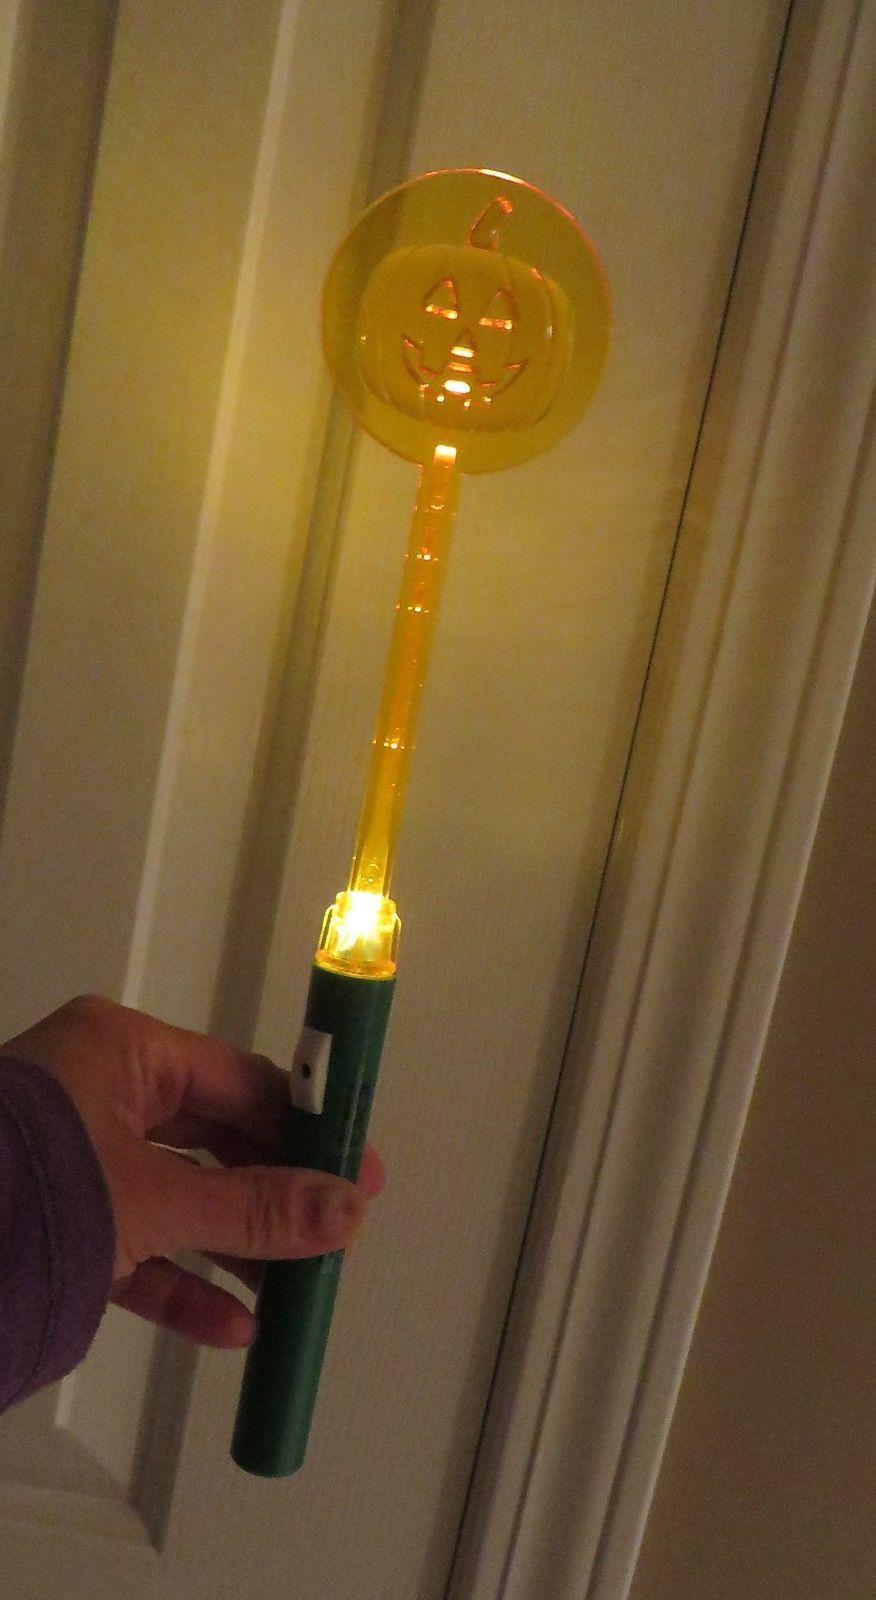 Lot of 10 Halloween Pumpkin Light Sticks Nite Lite for Trick-or-Treating NIP!